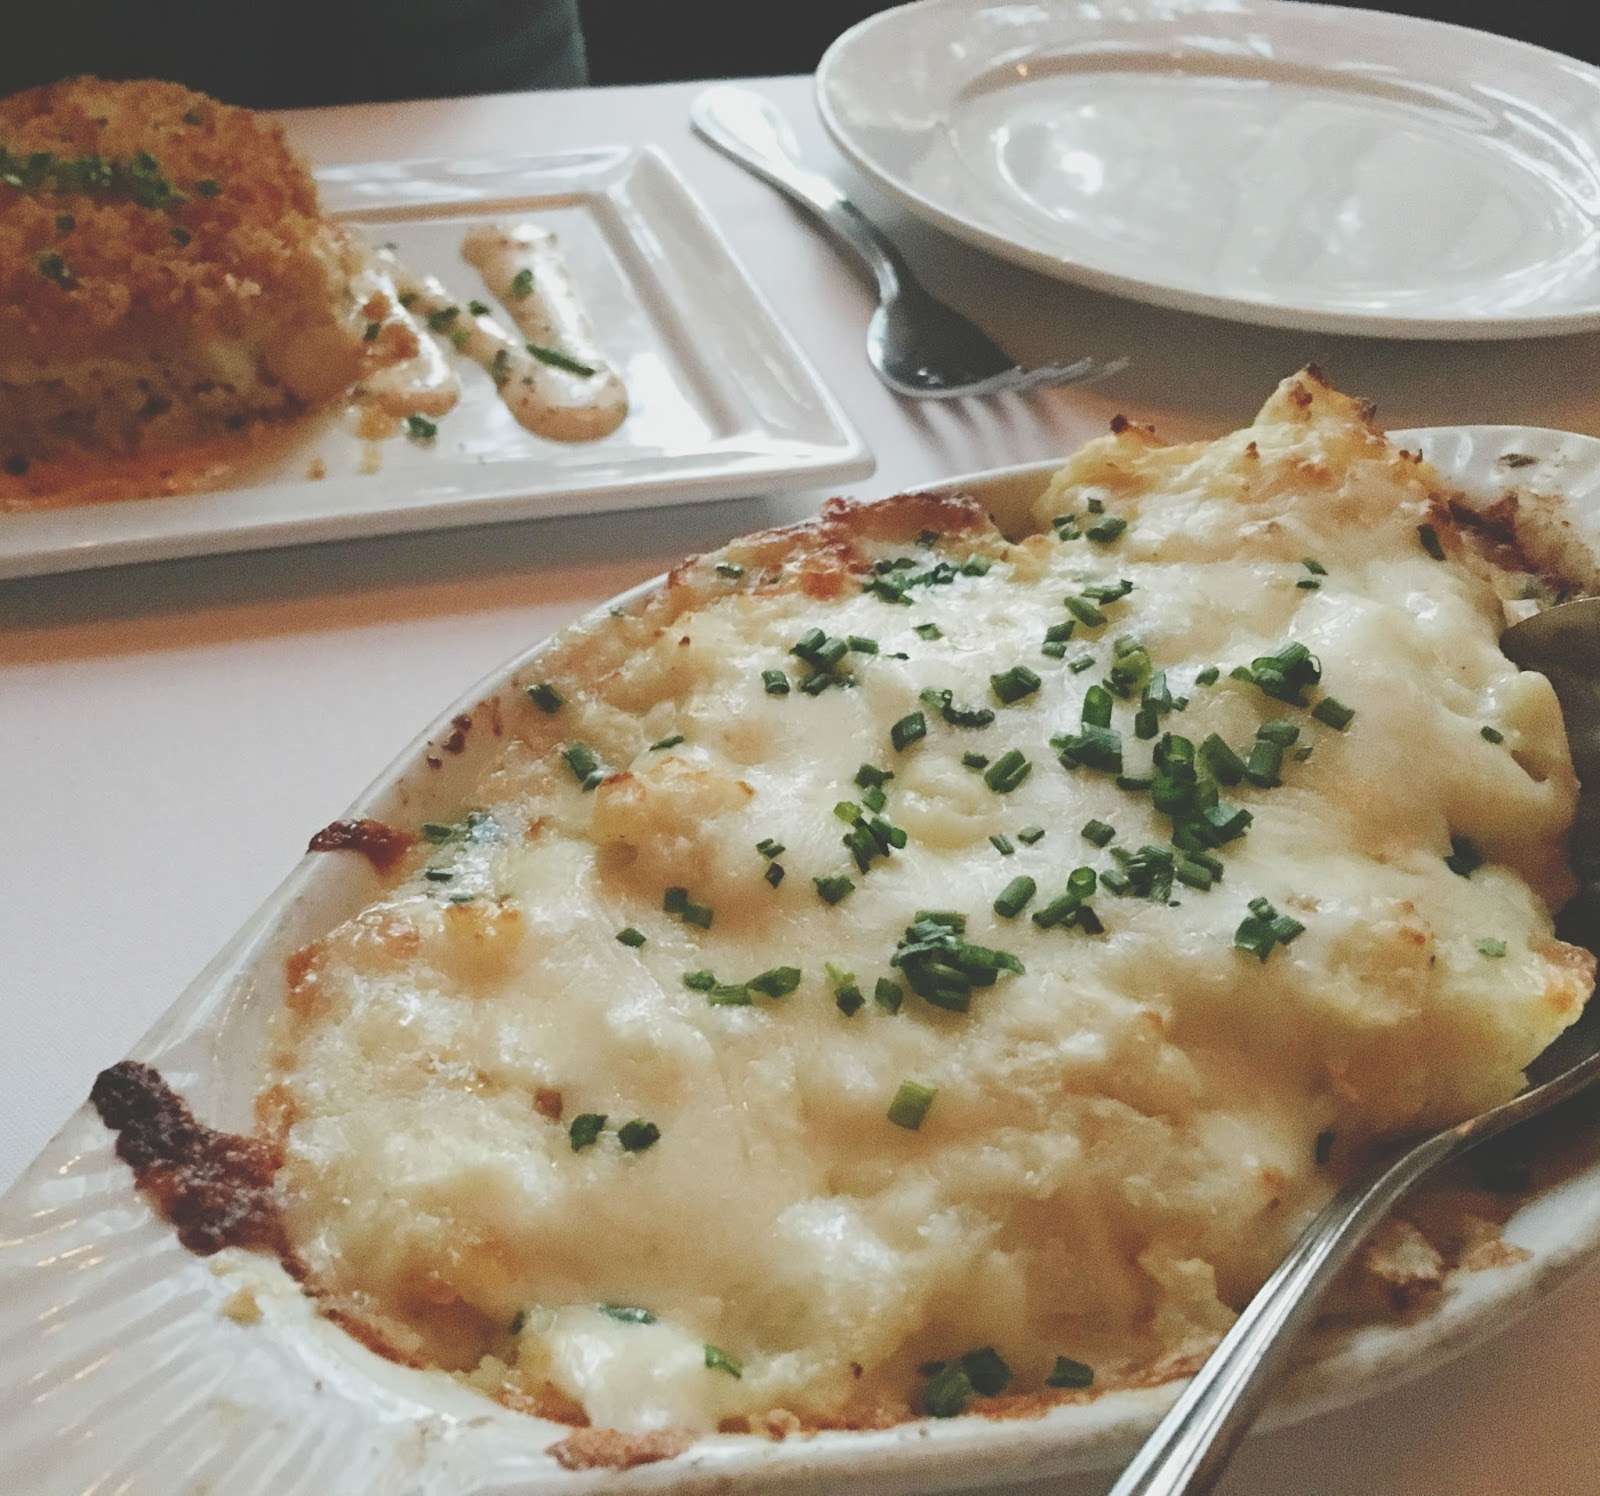 potatoes au gratin at Eddie V's - A restaurant in Houston, Texas